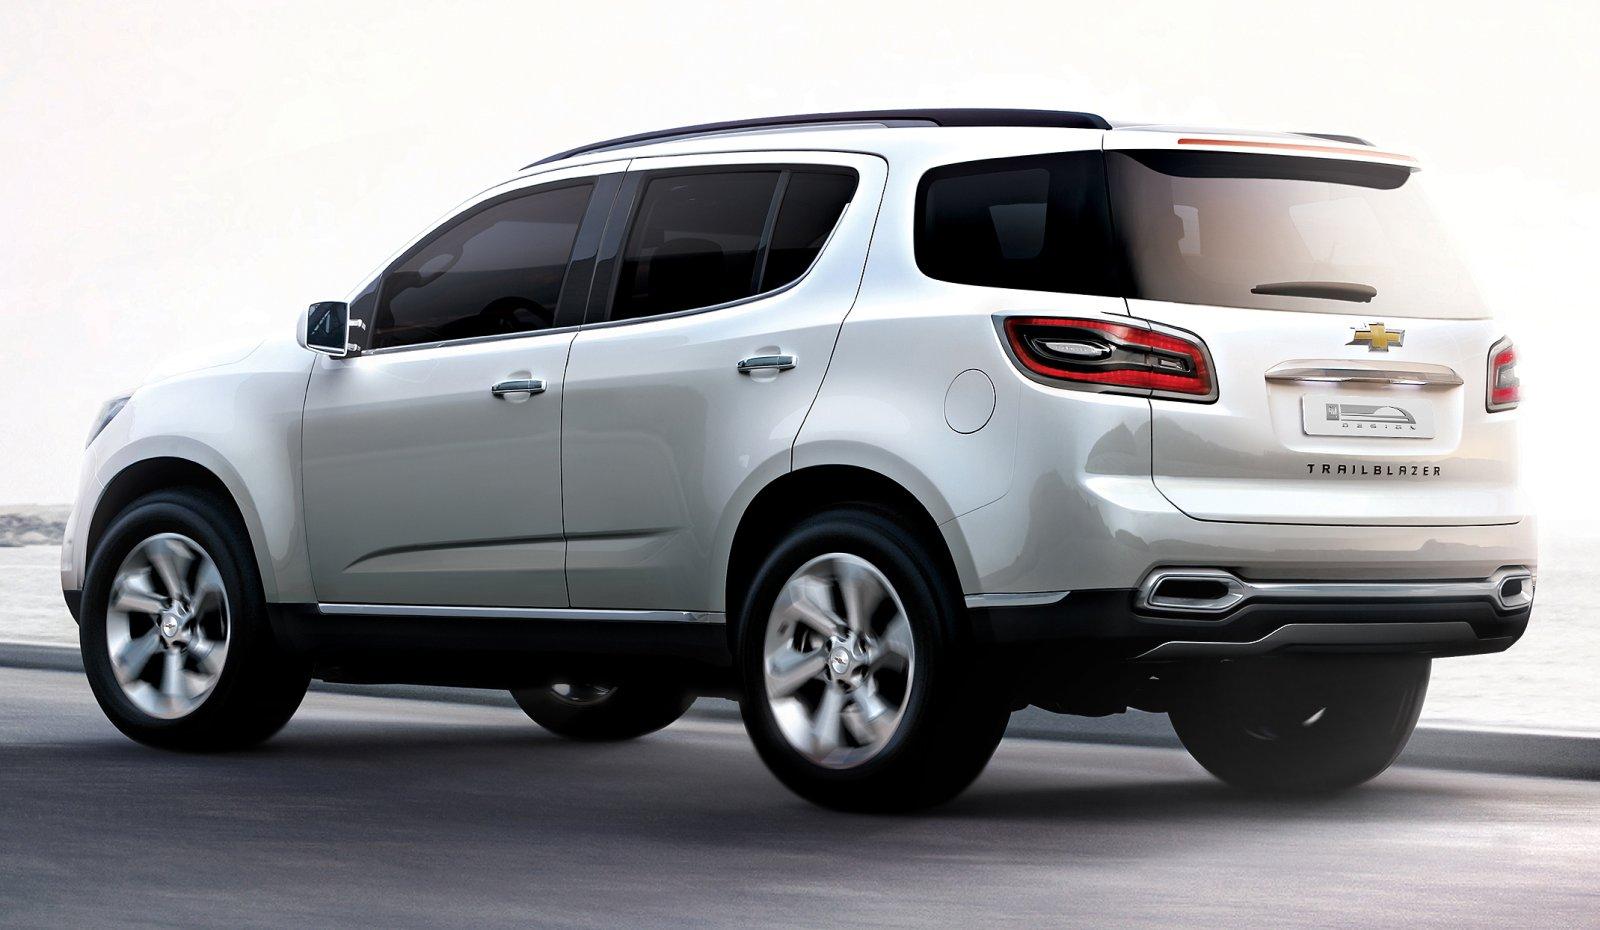 2016 Chevy Trailblazer >> Chevrolet TrailBlazer show SUV breaks cover in Dubai Image 76224